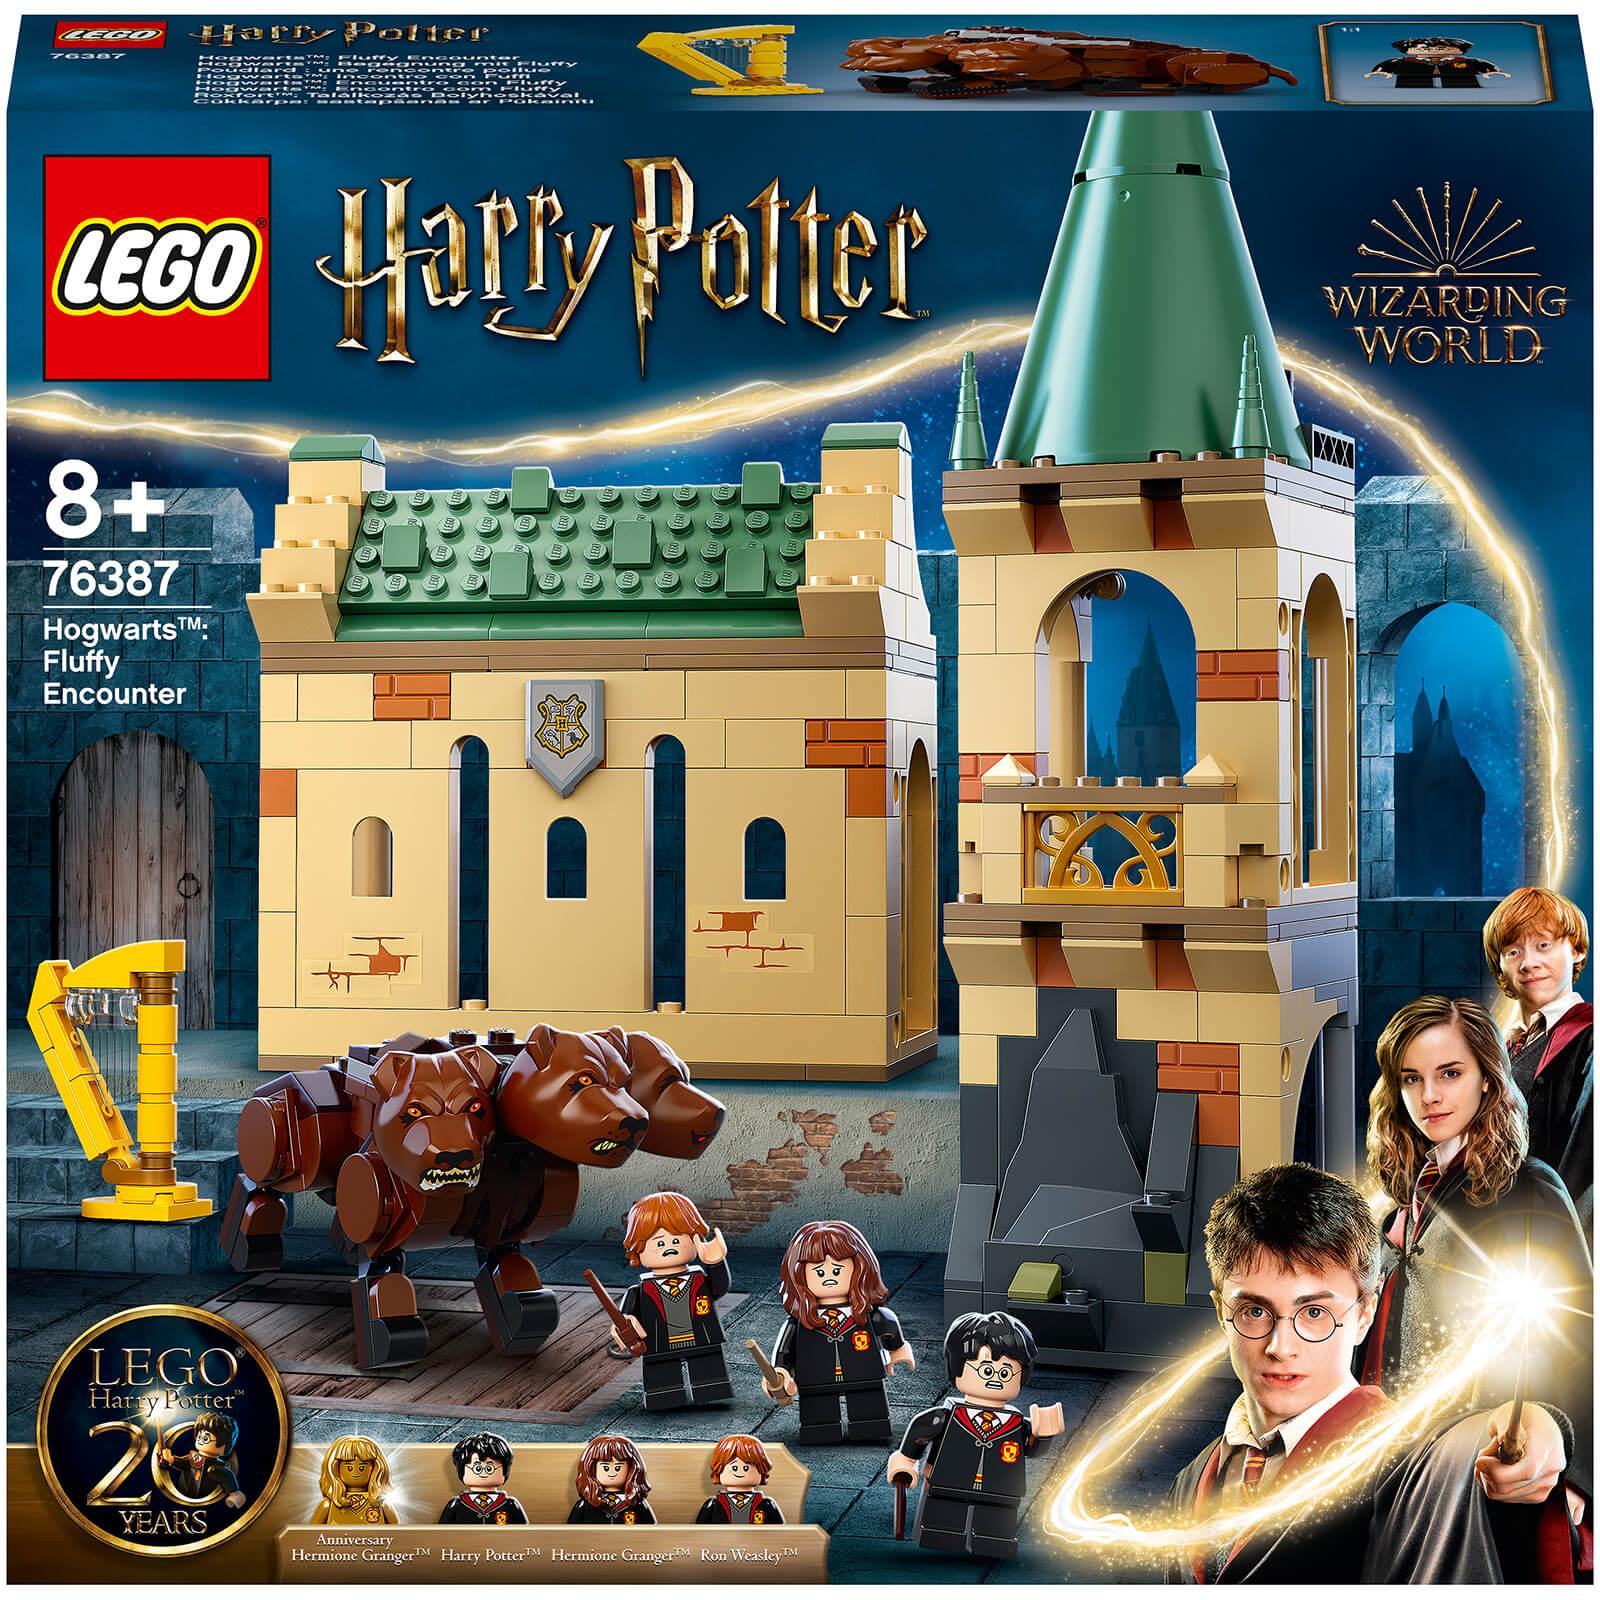 Image of LEGO Harry Potter Fluffy Encounter Toy (76387)